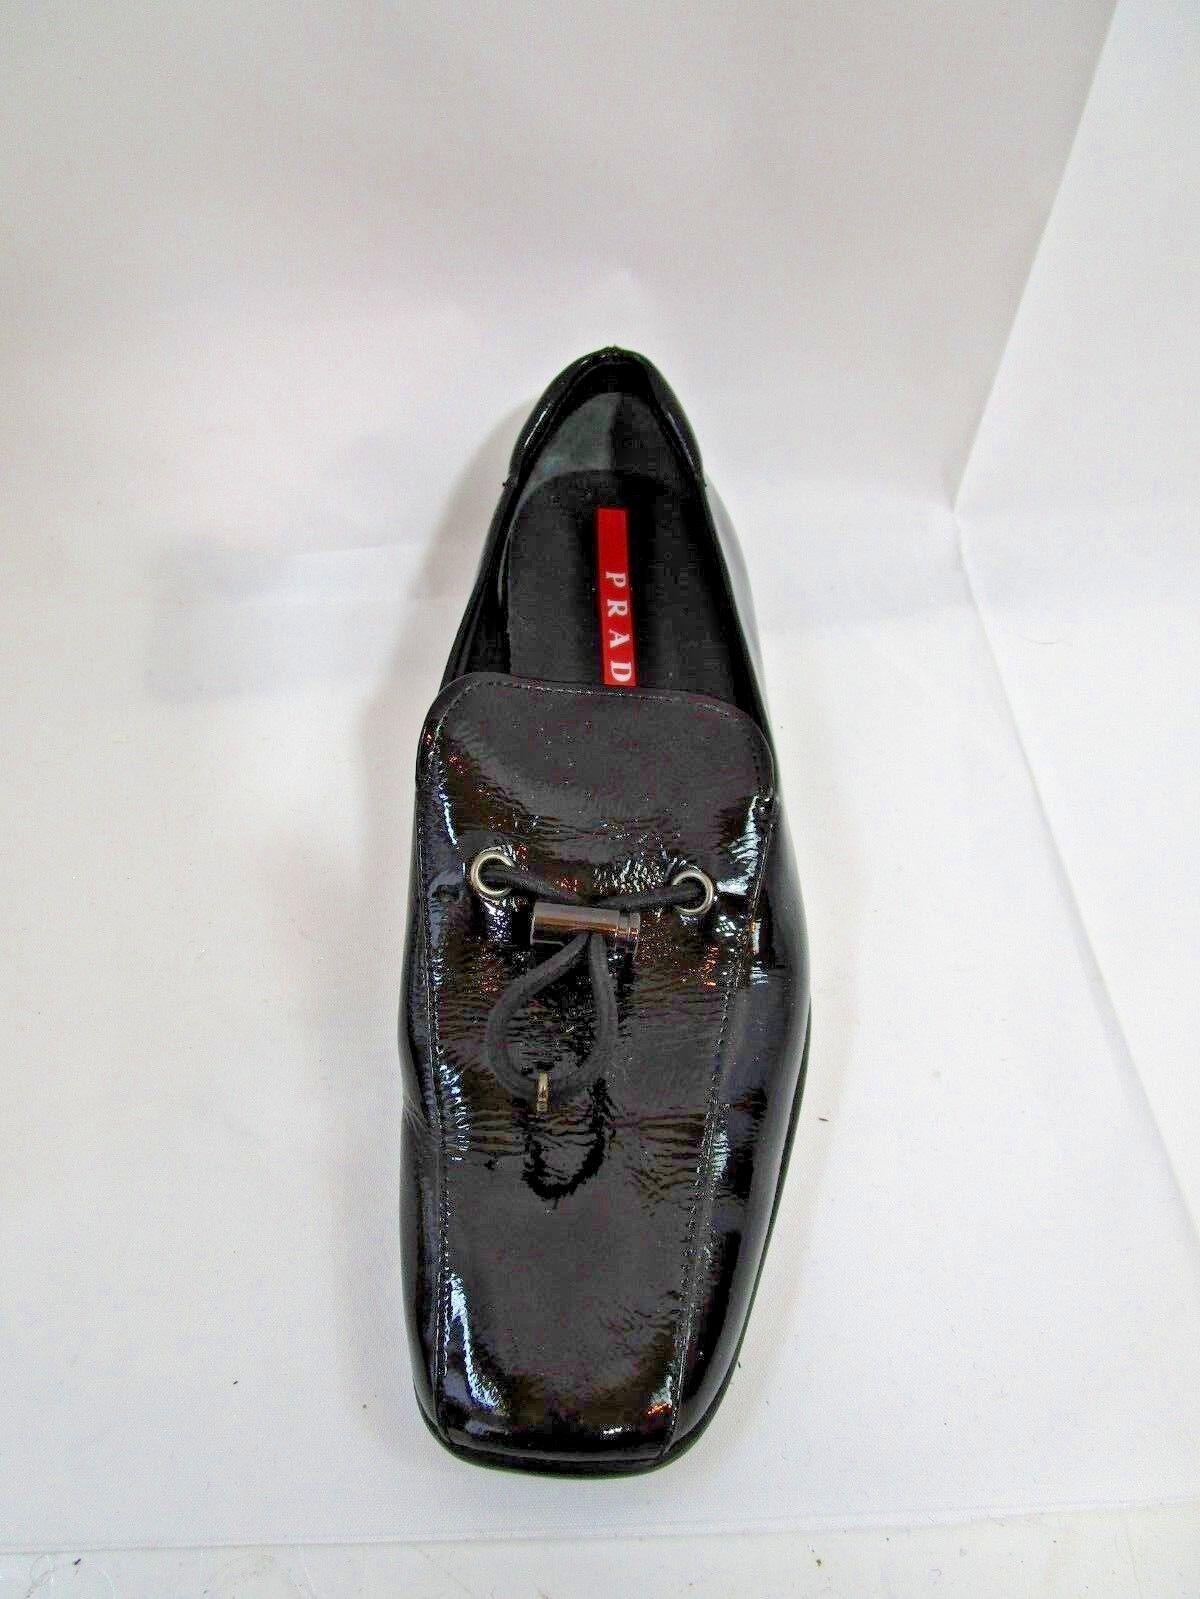 Prada Black Patent Leather Loafer SZ 5 Mint